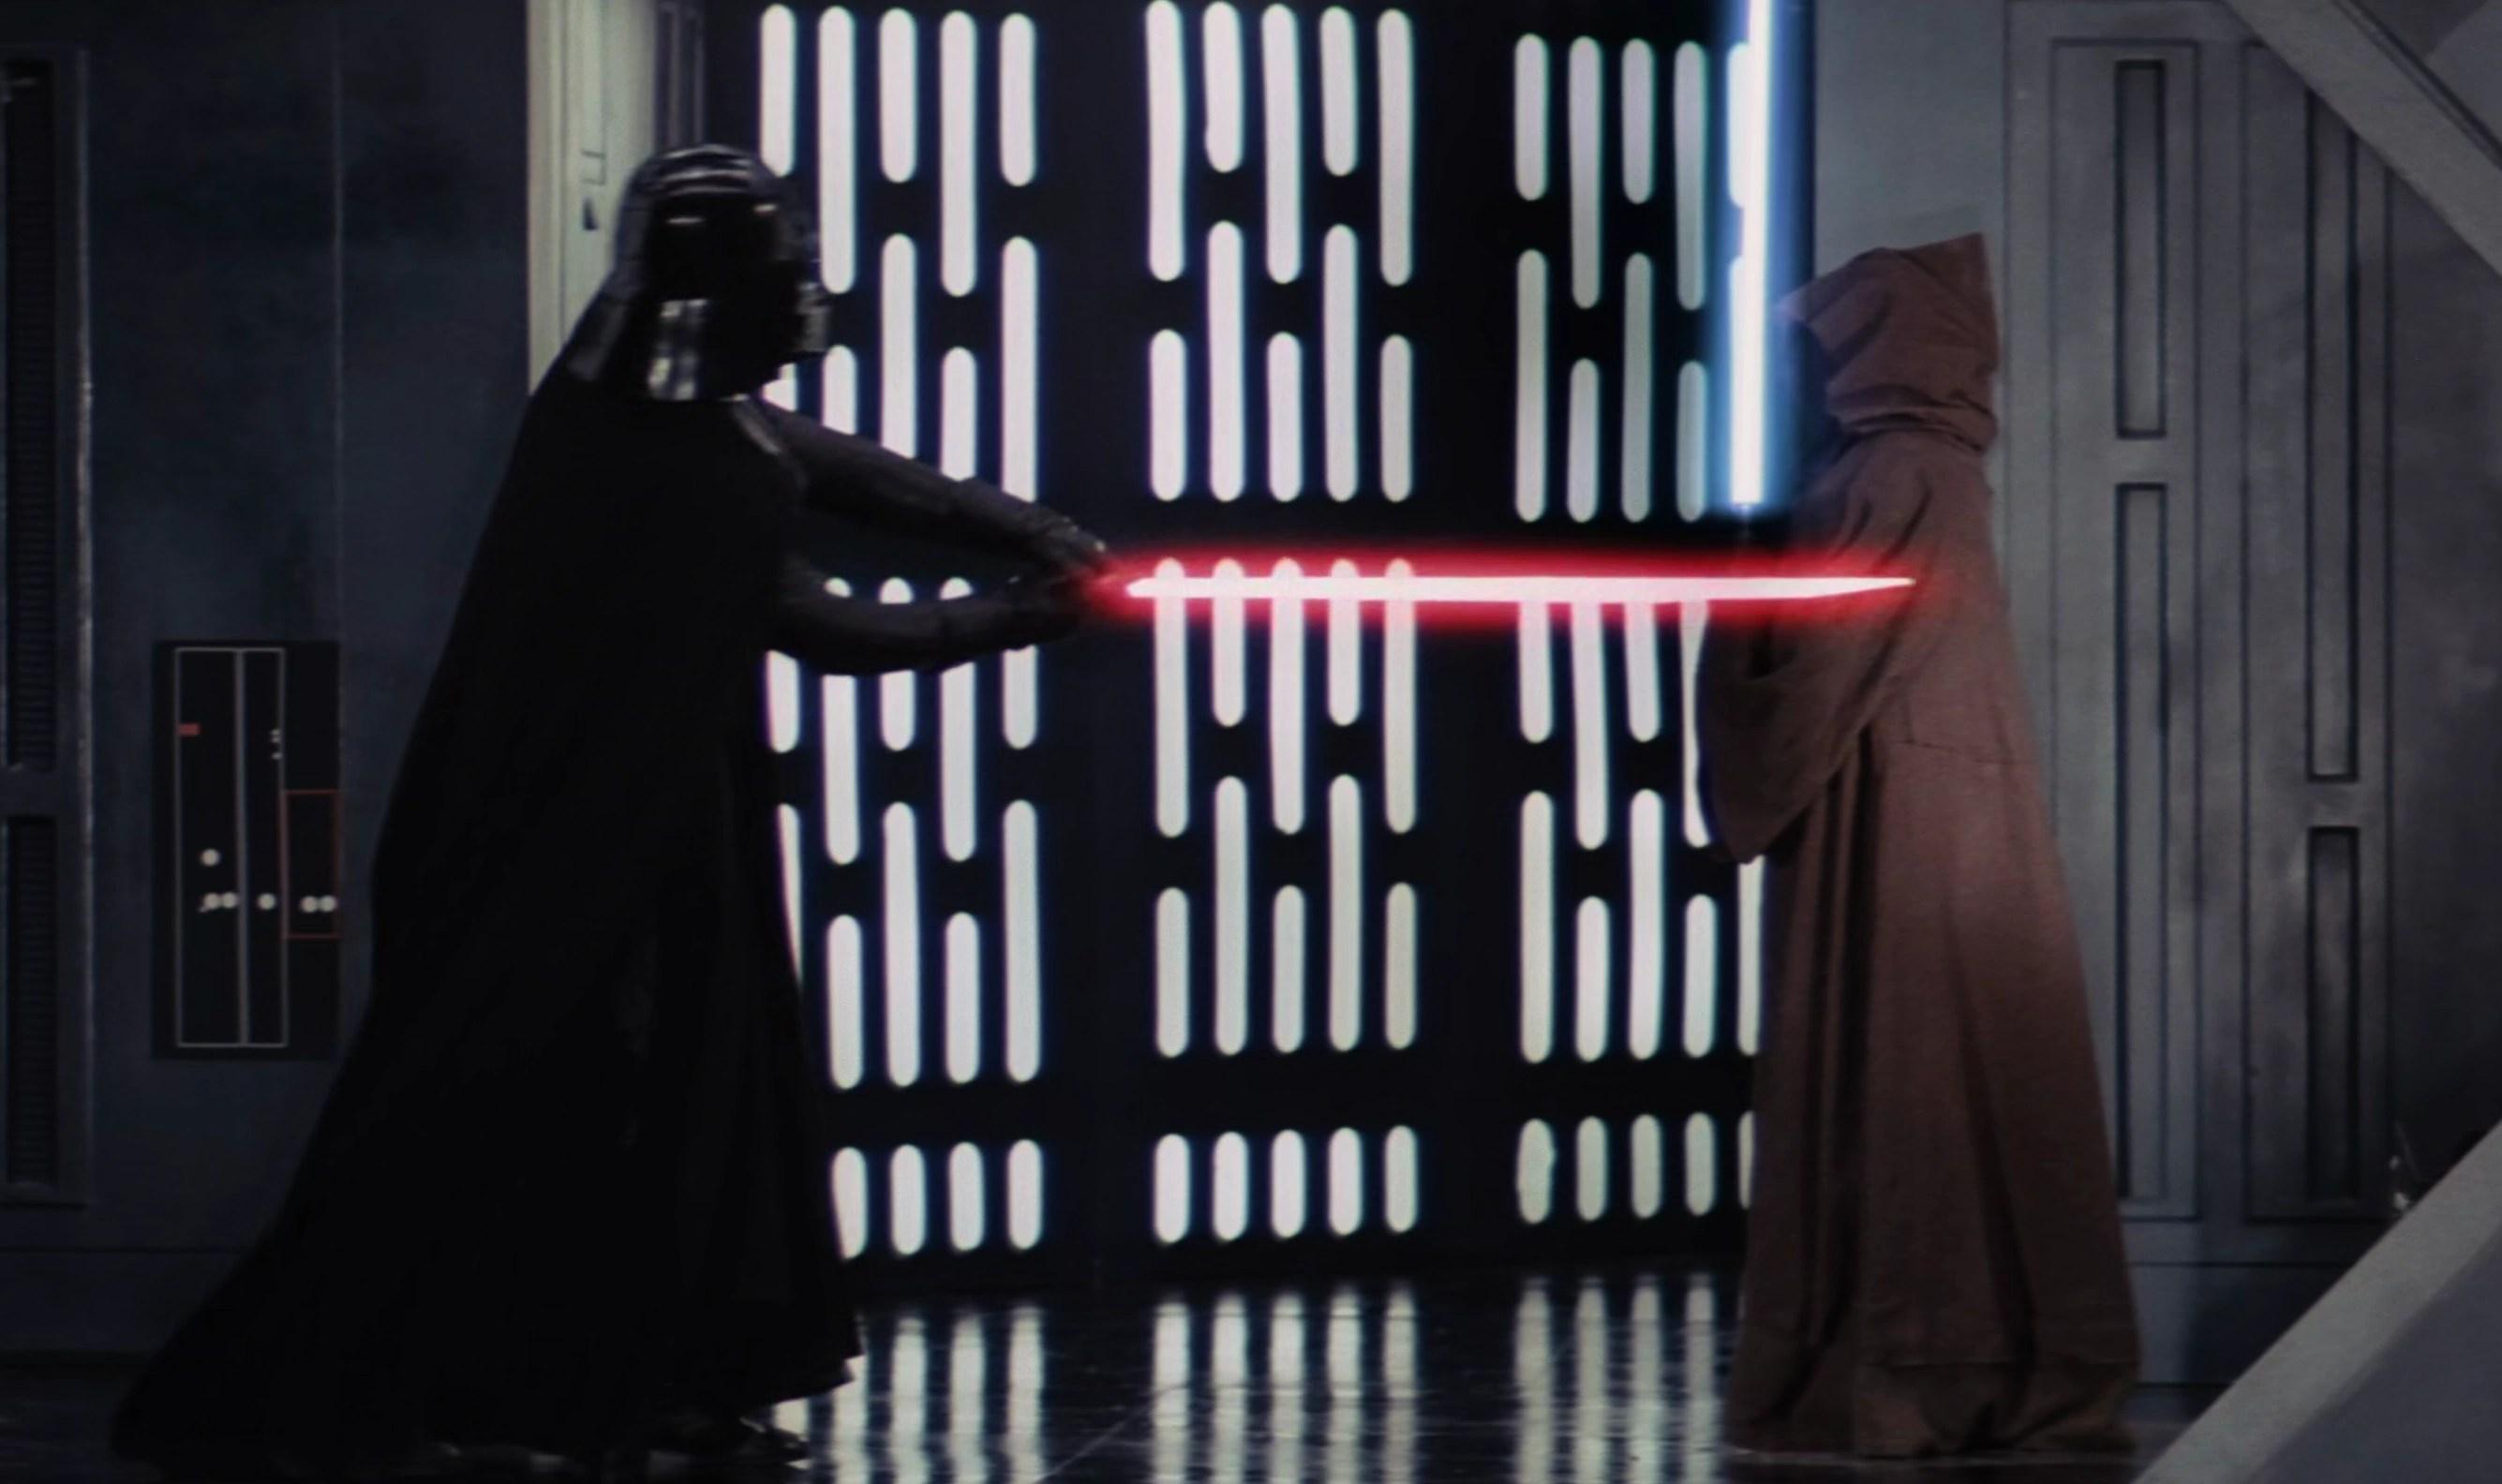 Obi Wan Kenobi death, Obi Wan Kenobi death star, obi wan kenobi fights darth vader